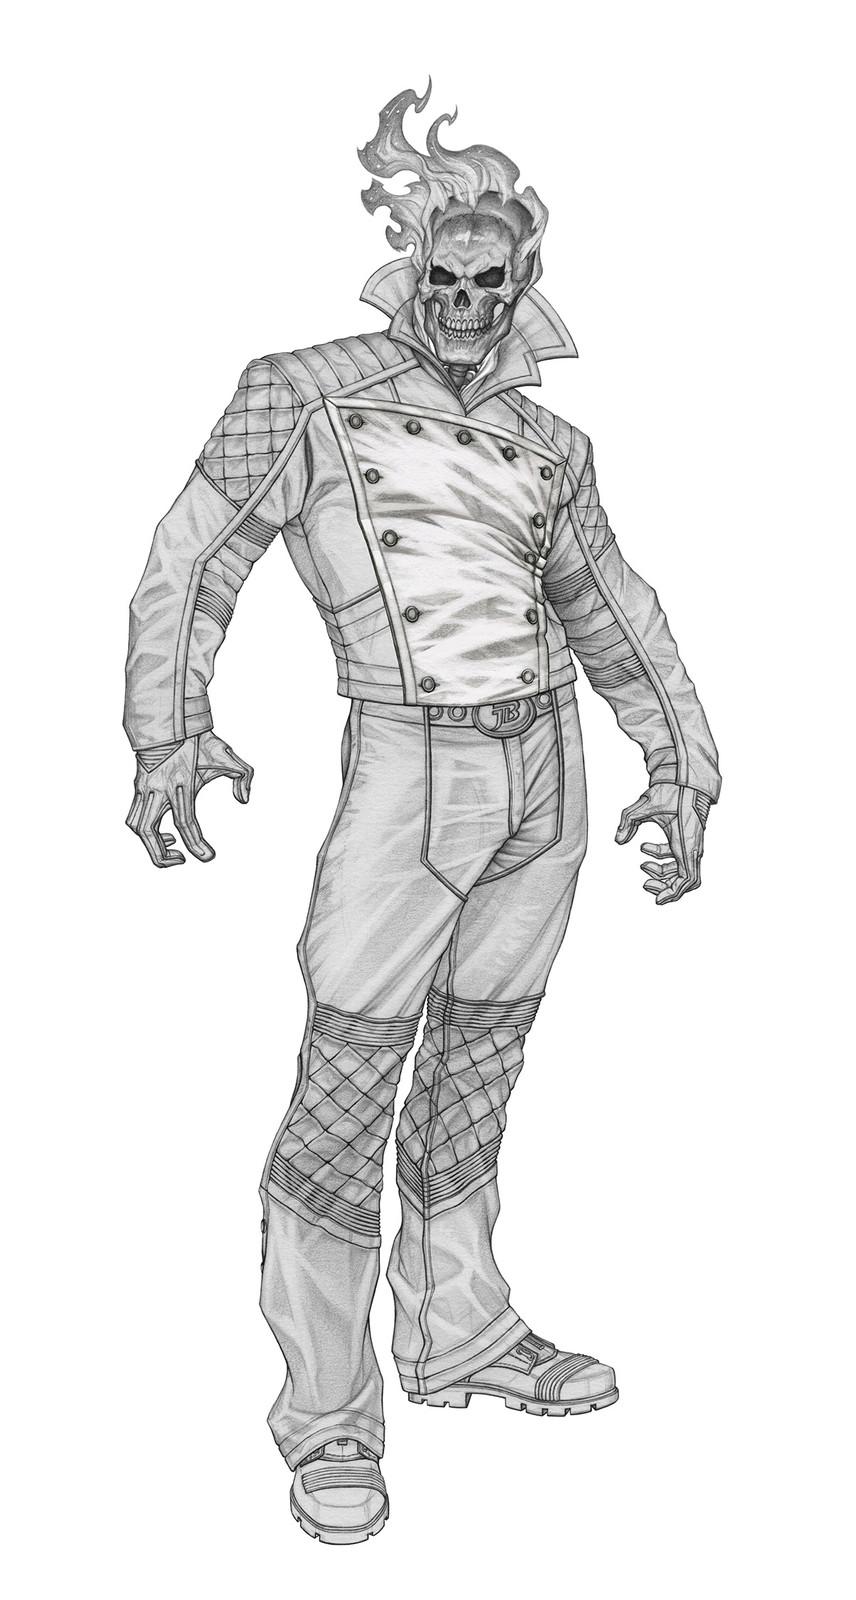 Pencil rendering - with bib